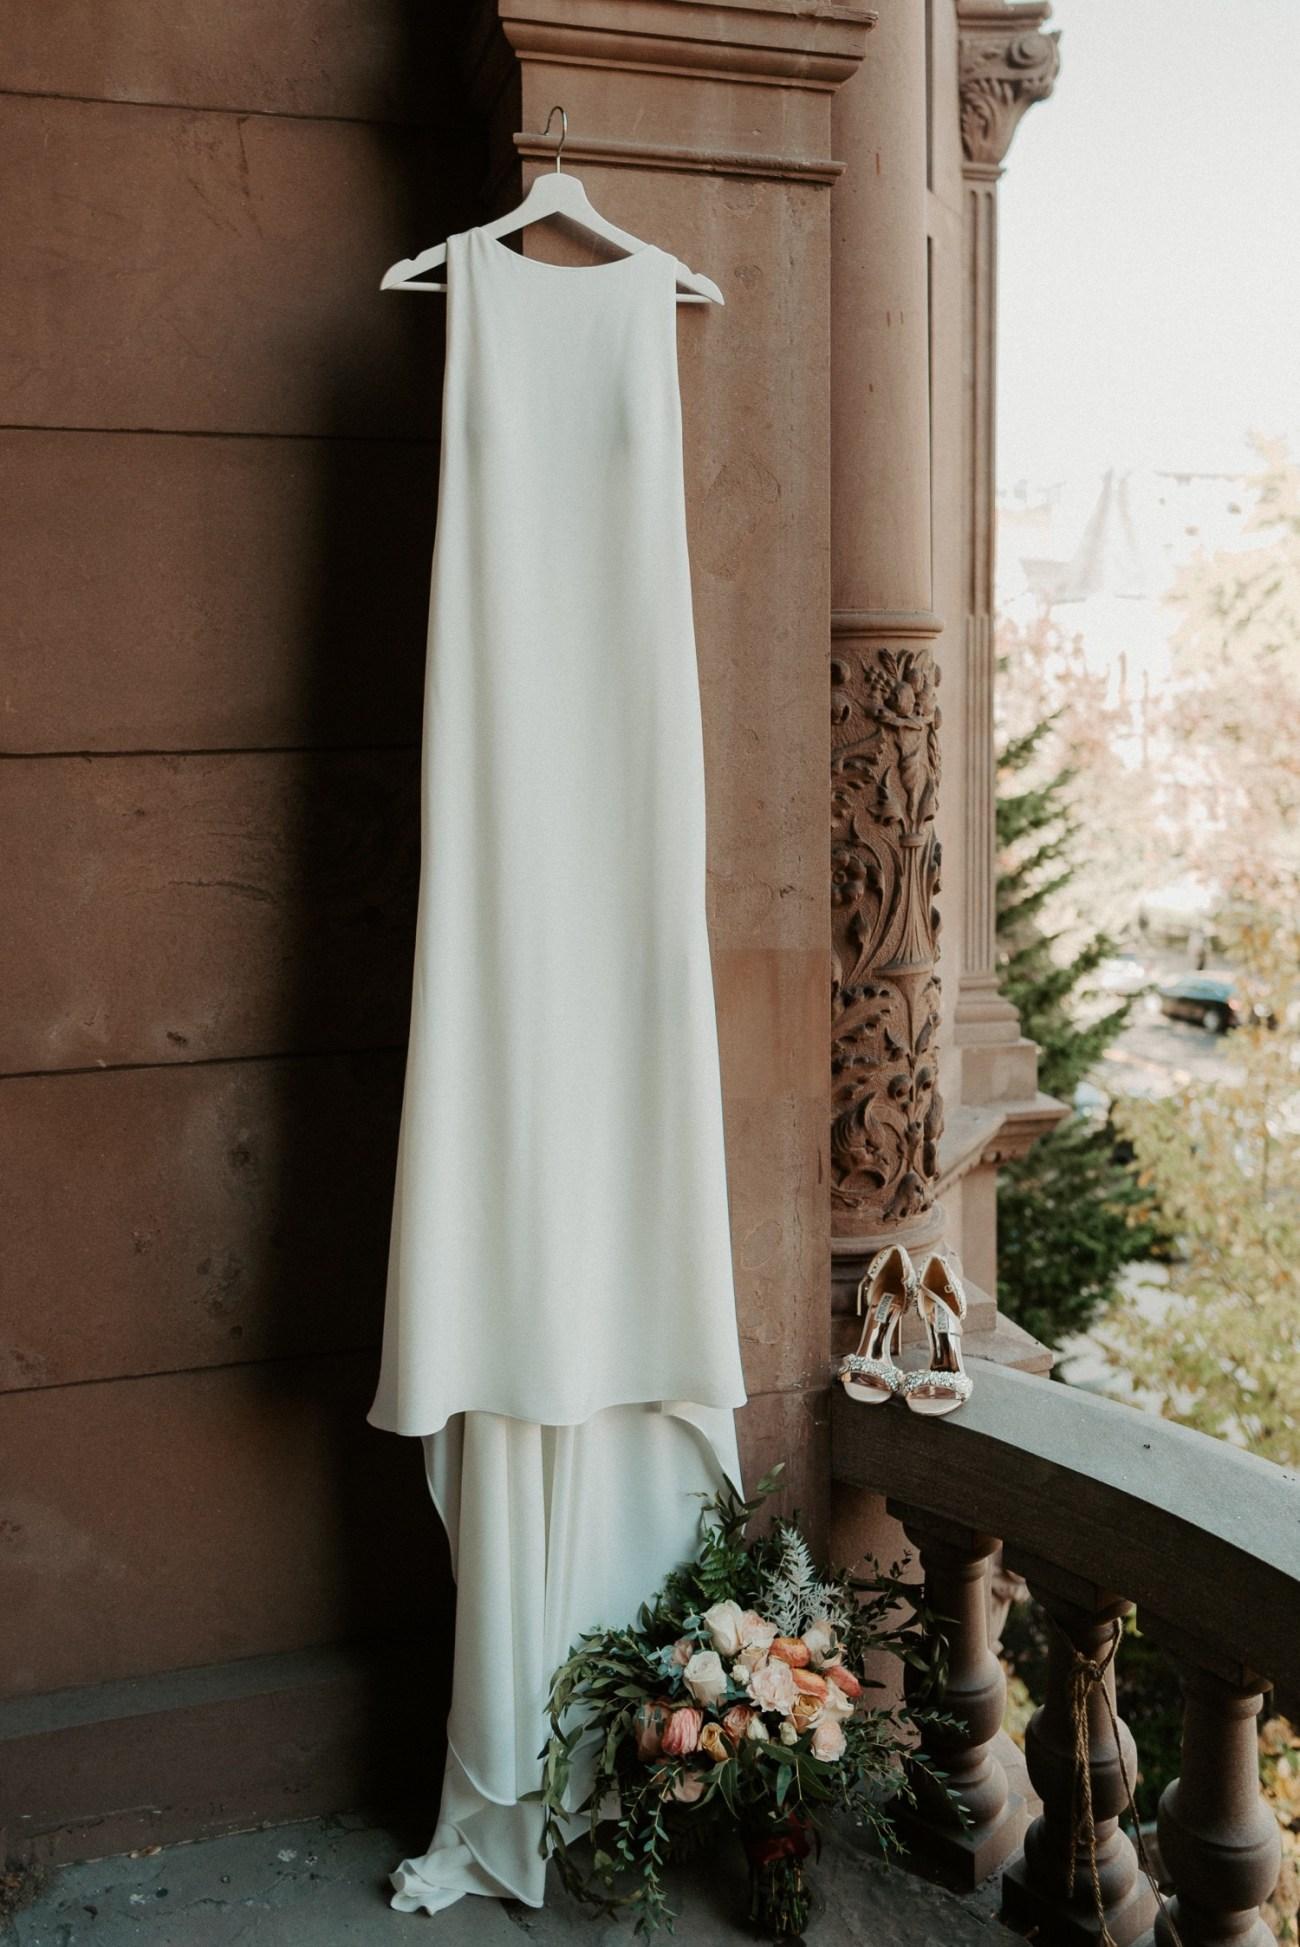 Brooklyn Brownstone House Backyard Wedding New York Wedding Photographer Anais Possamai Photography 03